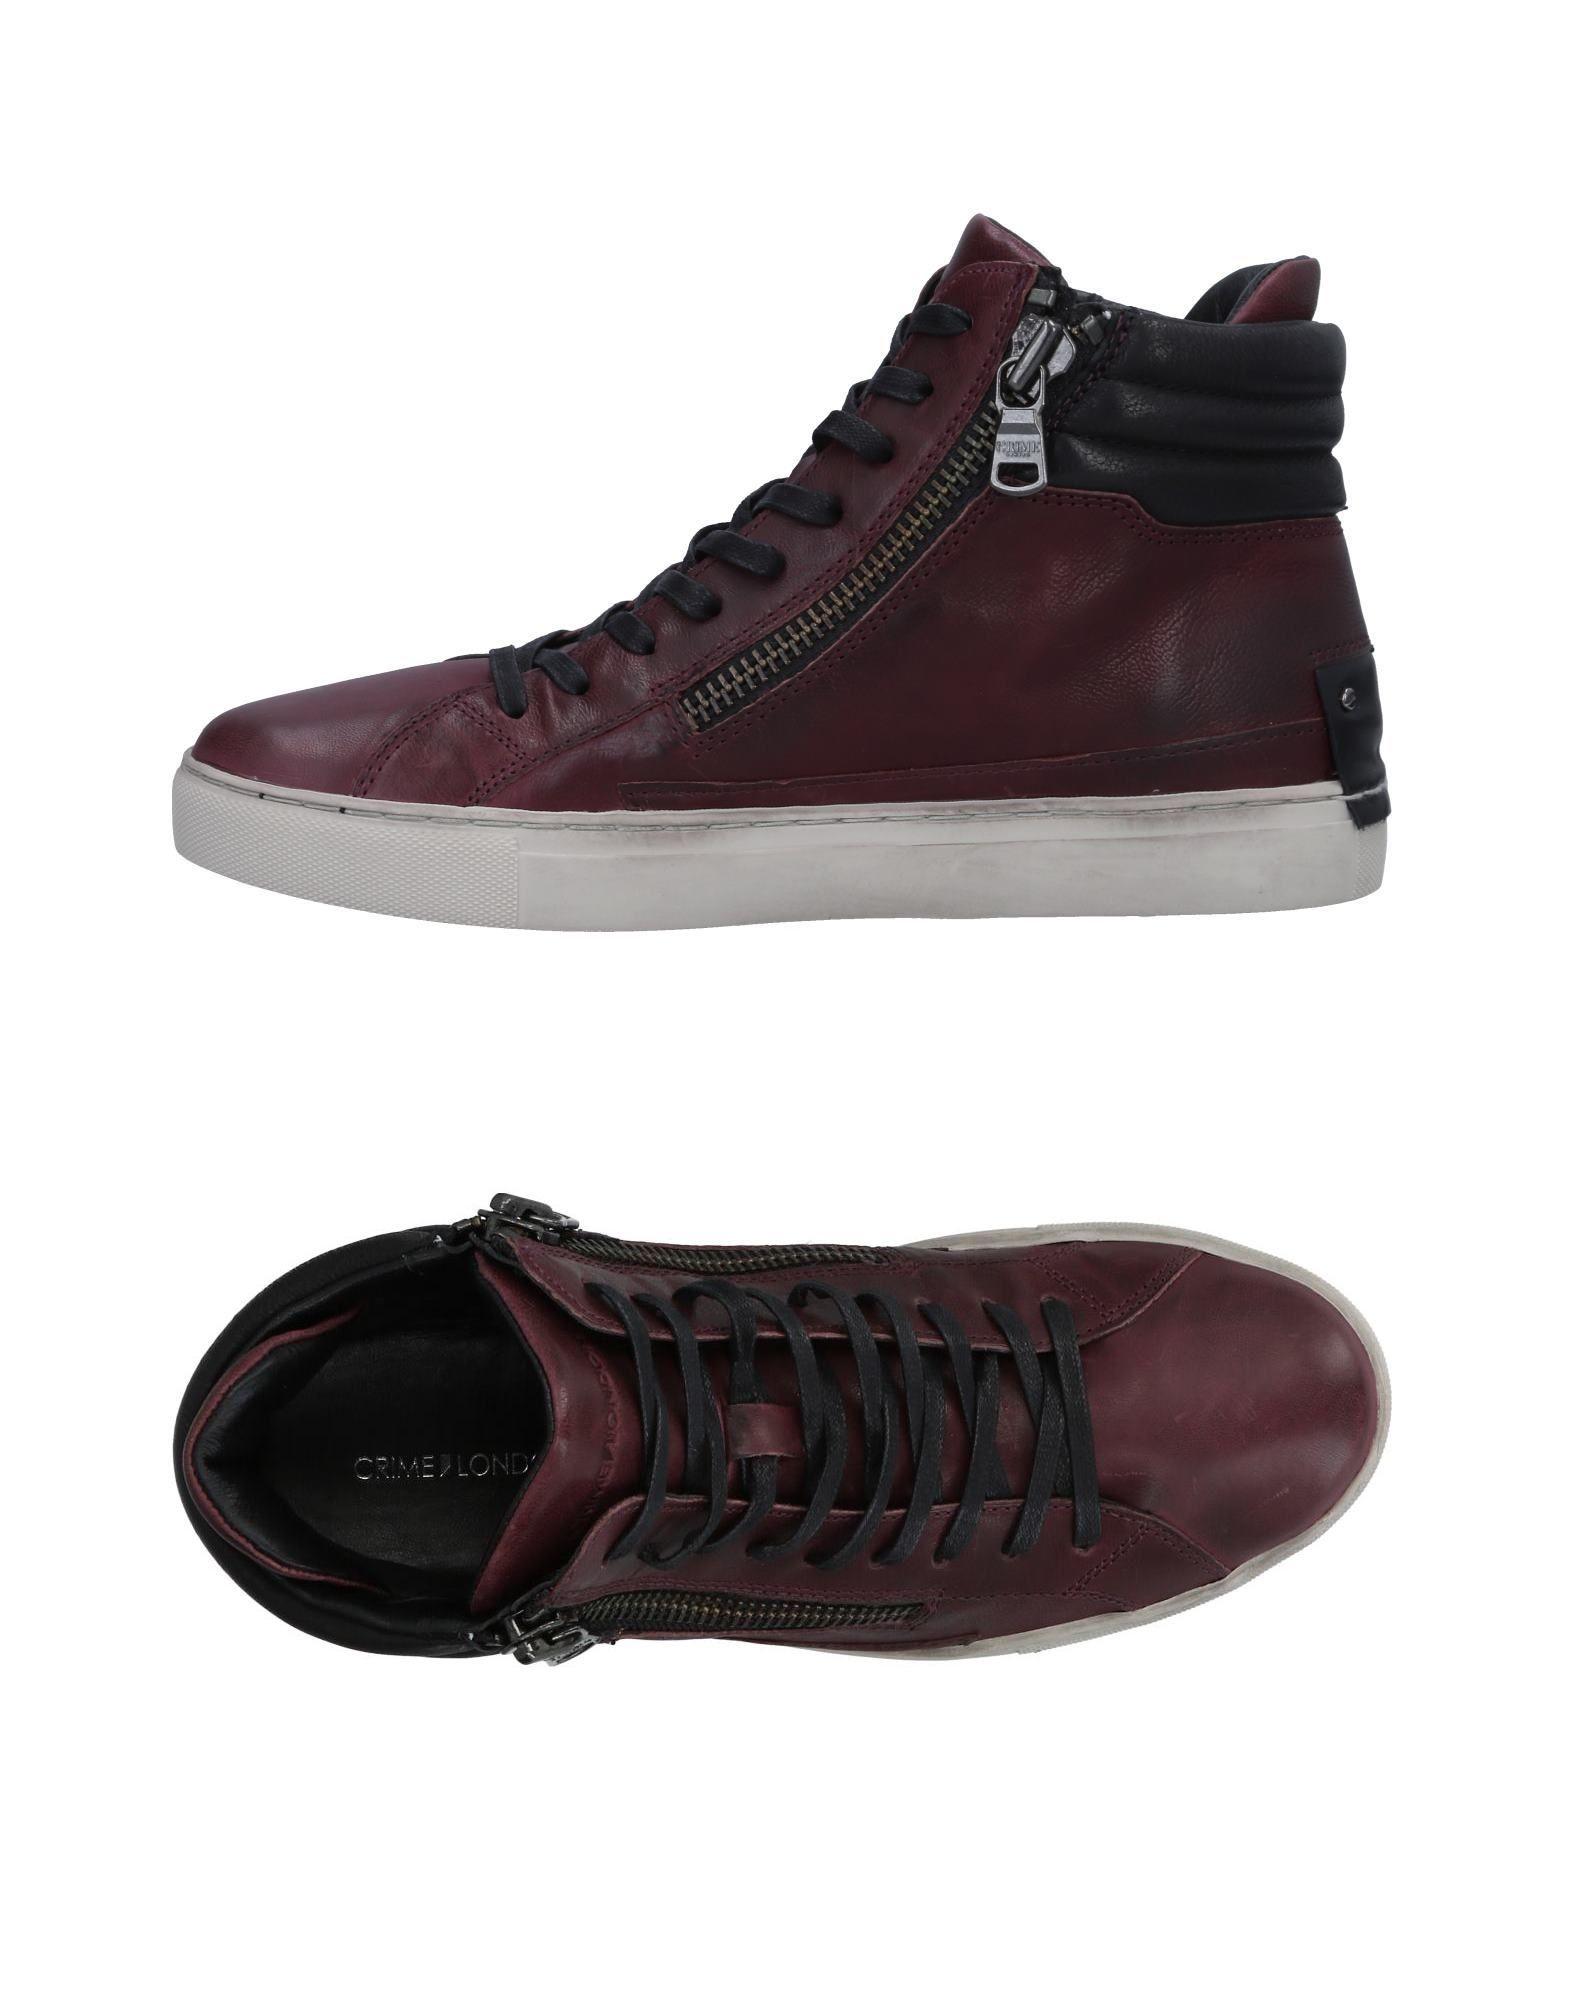 Rabatt echte Schuhe Crime London Sneakers Herren  11497139KB 11497139KB 11497139KB 31e32c